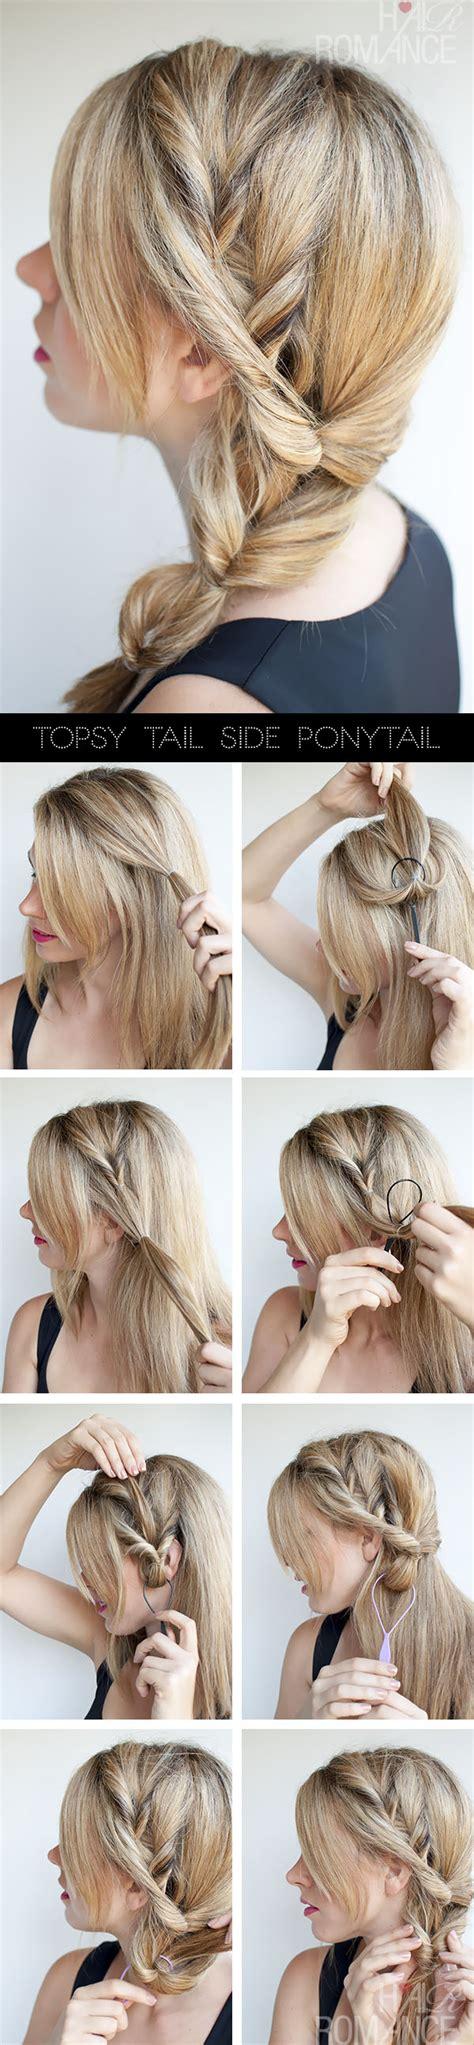 parting tutorial for braiding hair topsy tail ponytail tutorial the no braid side braid